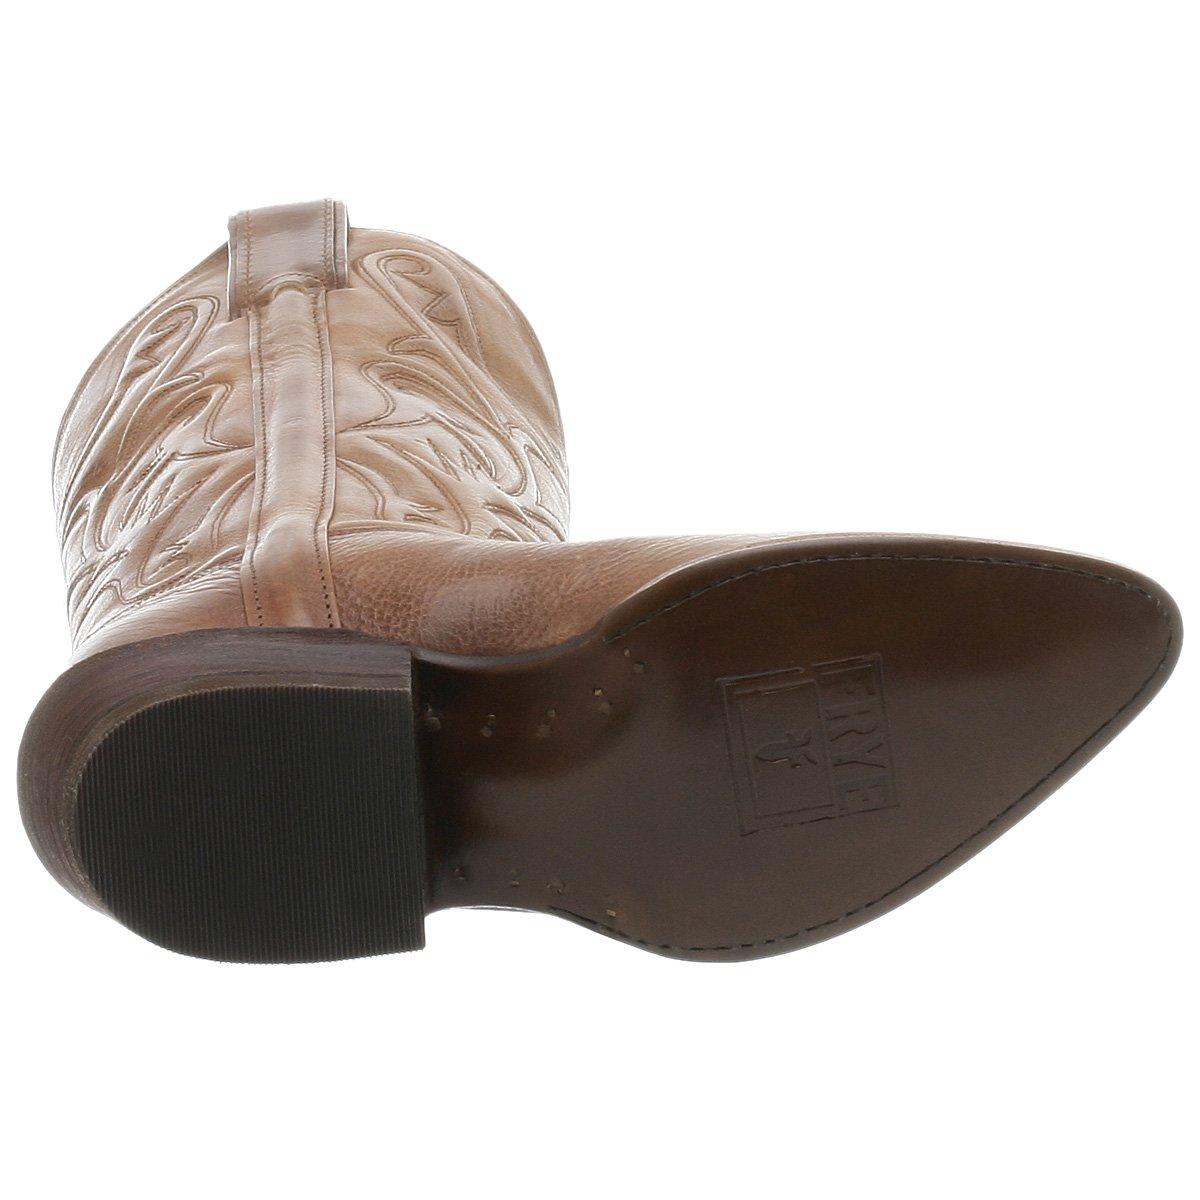 FRYE Women's Bruce M Pull-On Boot B000TKBIWA 8.5 M Bruce US|Cognac 9adafb